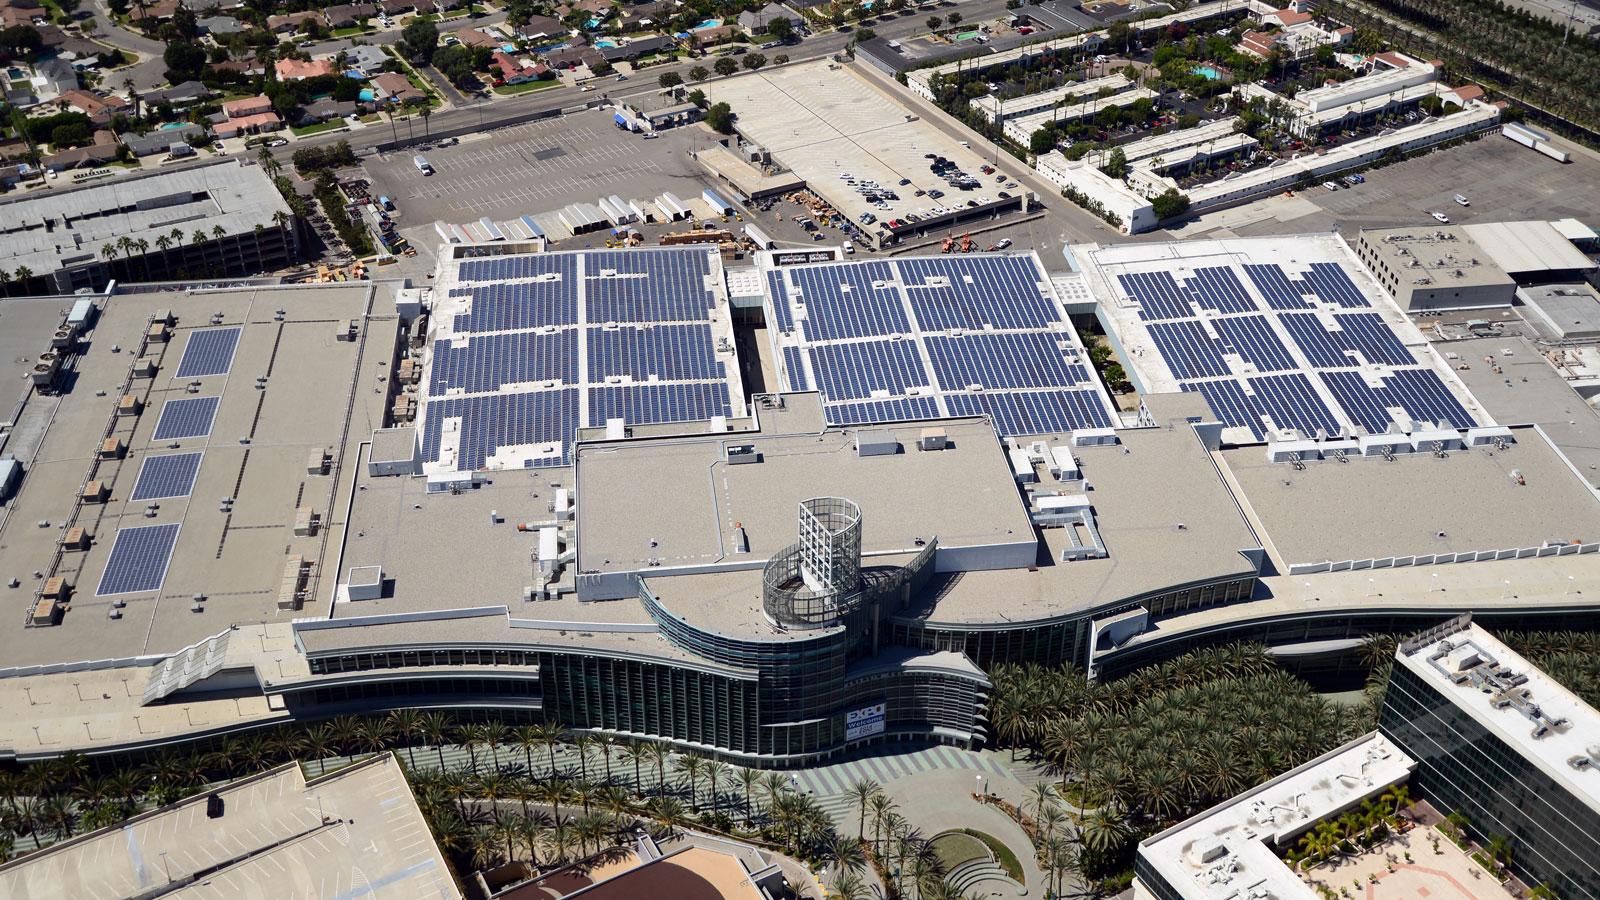 Anaheim Convention Center Solar 2.4 MW Project Celebrates One-Year Anniversary as it Hosts Solar Power International